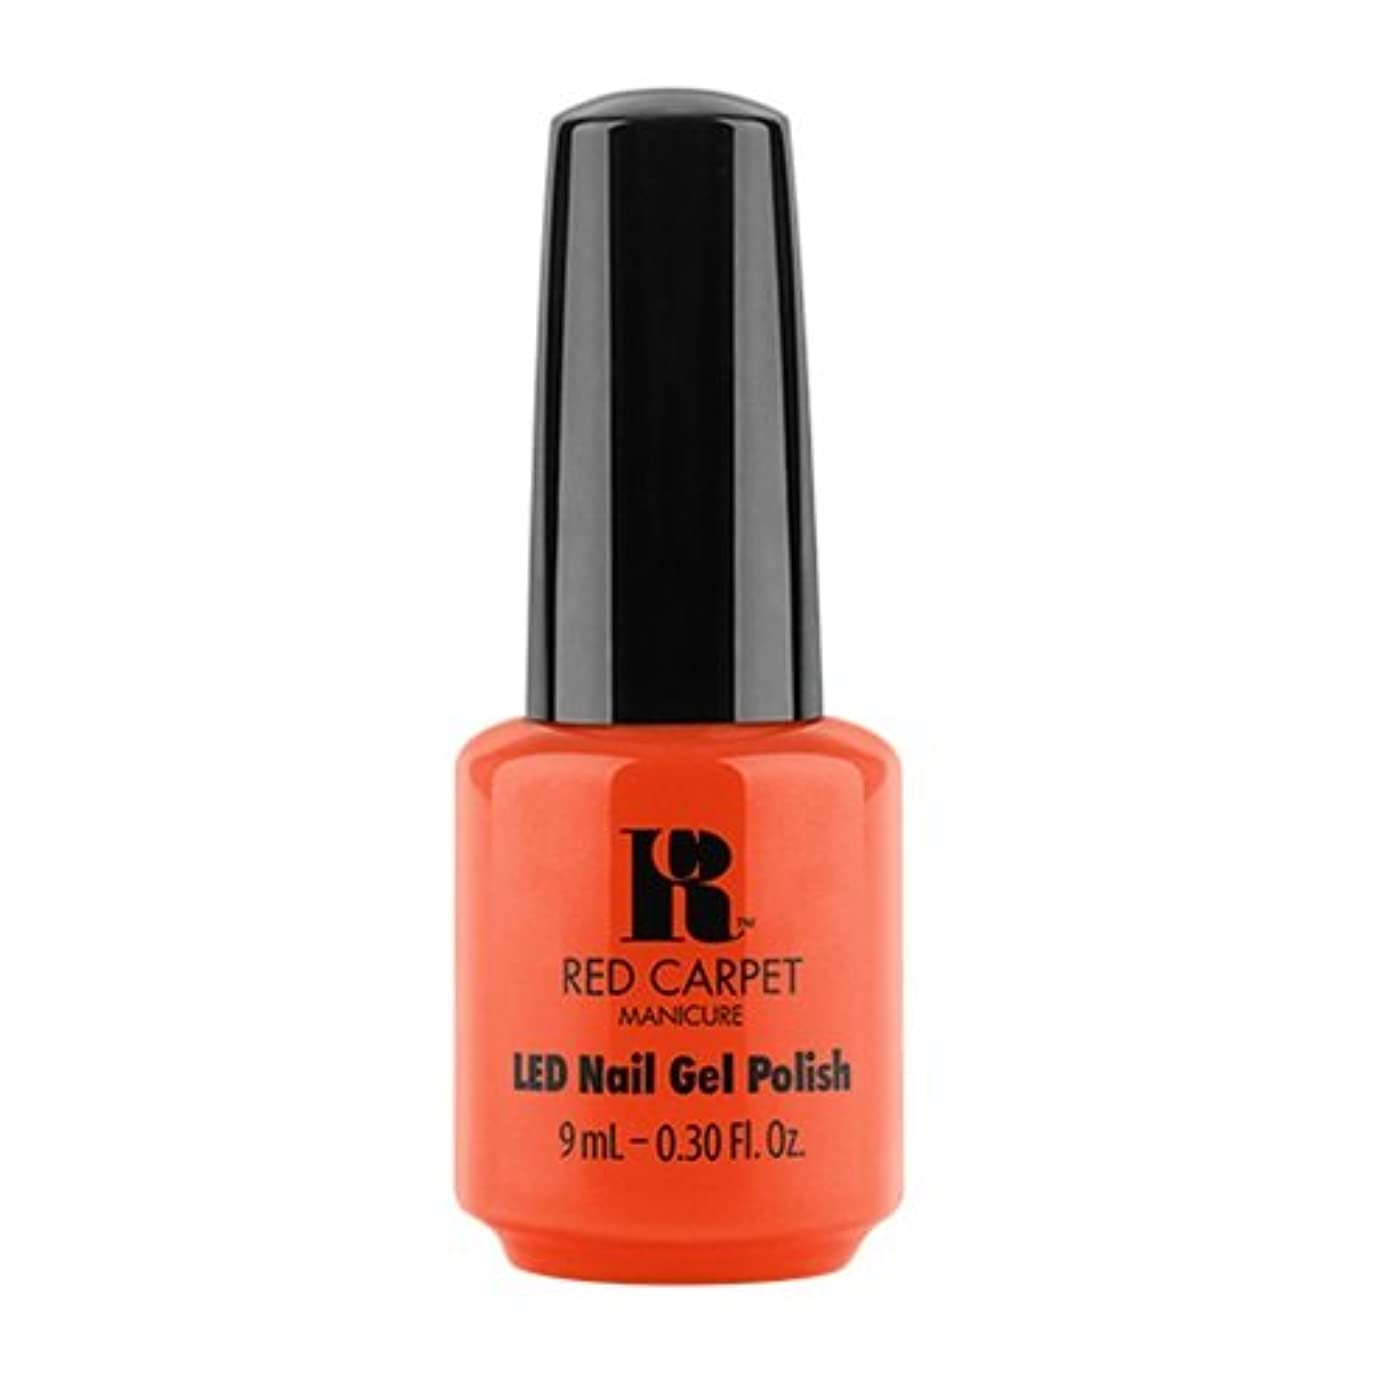 Red Carpet Manicure - LED Nail Gel Polish - Summer 2017 Fiji Fever - Neon Nights - 0.3oz / 9ml